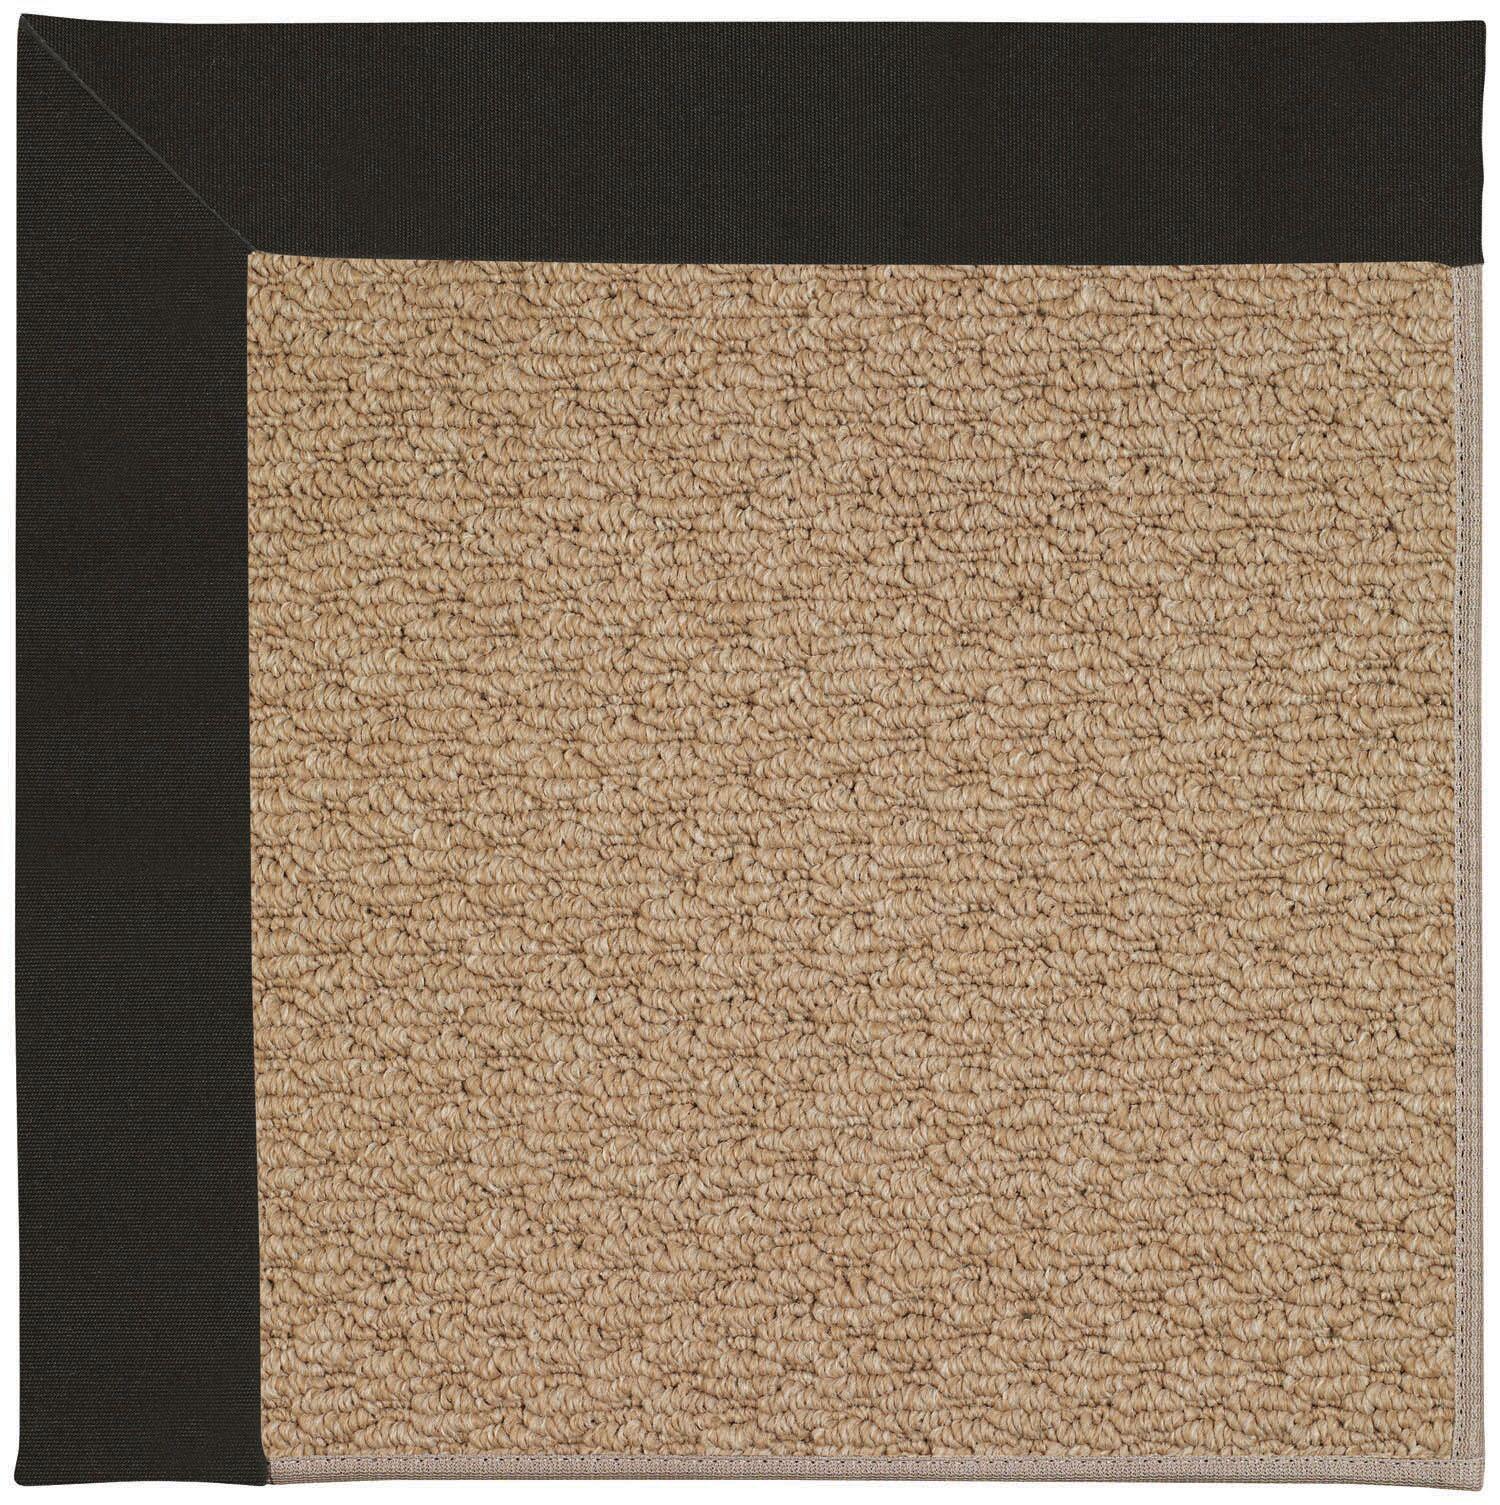 Lisle Machine Tufted Ebony and Beige Indoor/Outdoor Area Rug Rug Size: Rectangle 4' x 6'